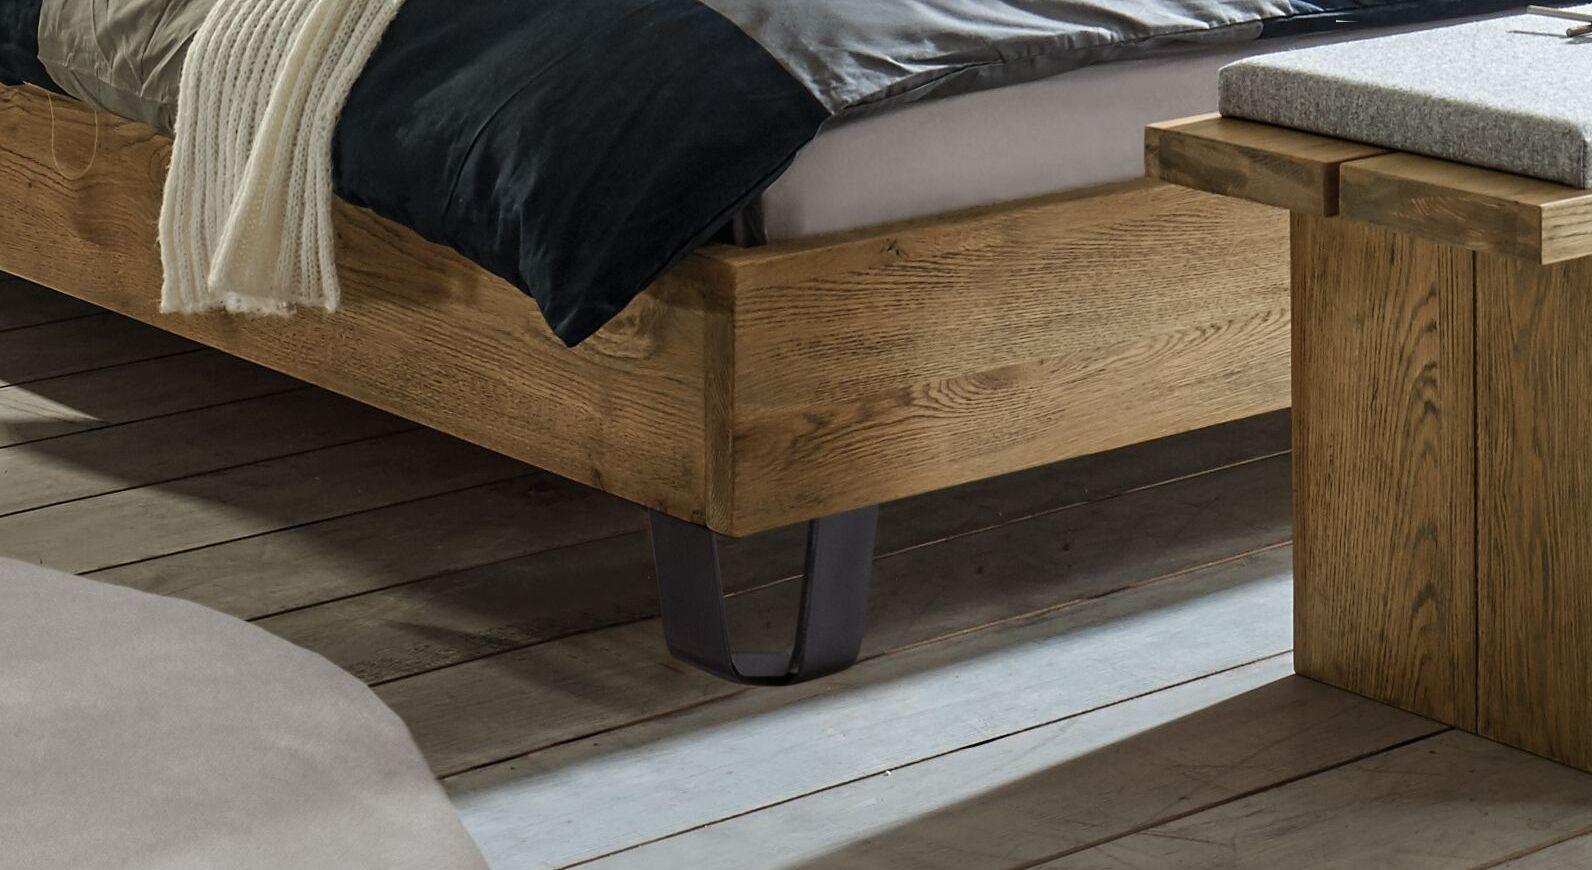 Metall-Füße vom Bett Ormar